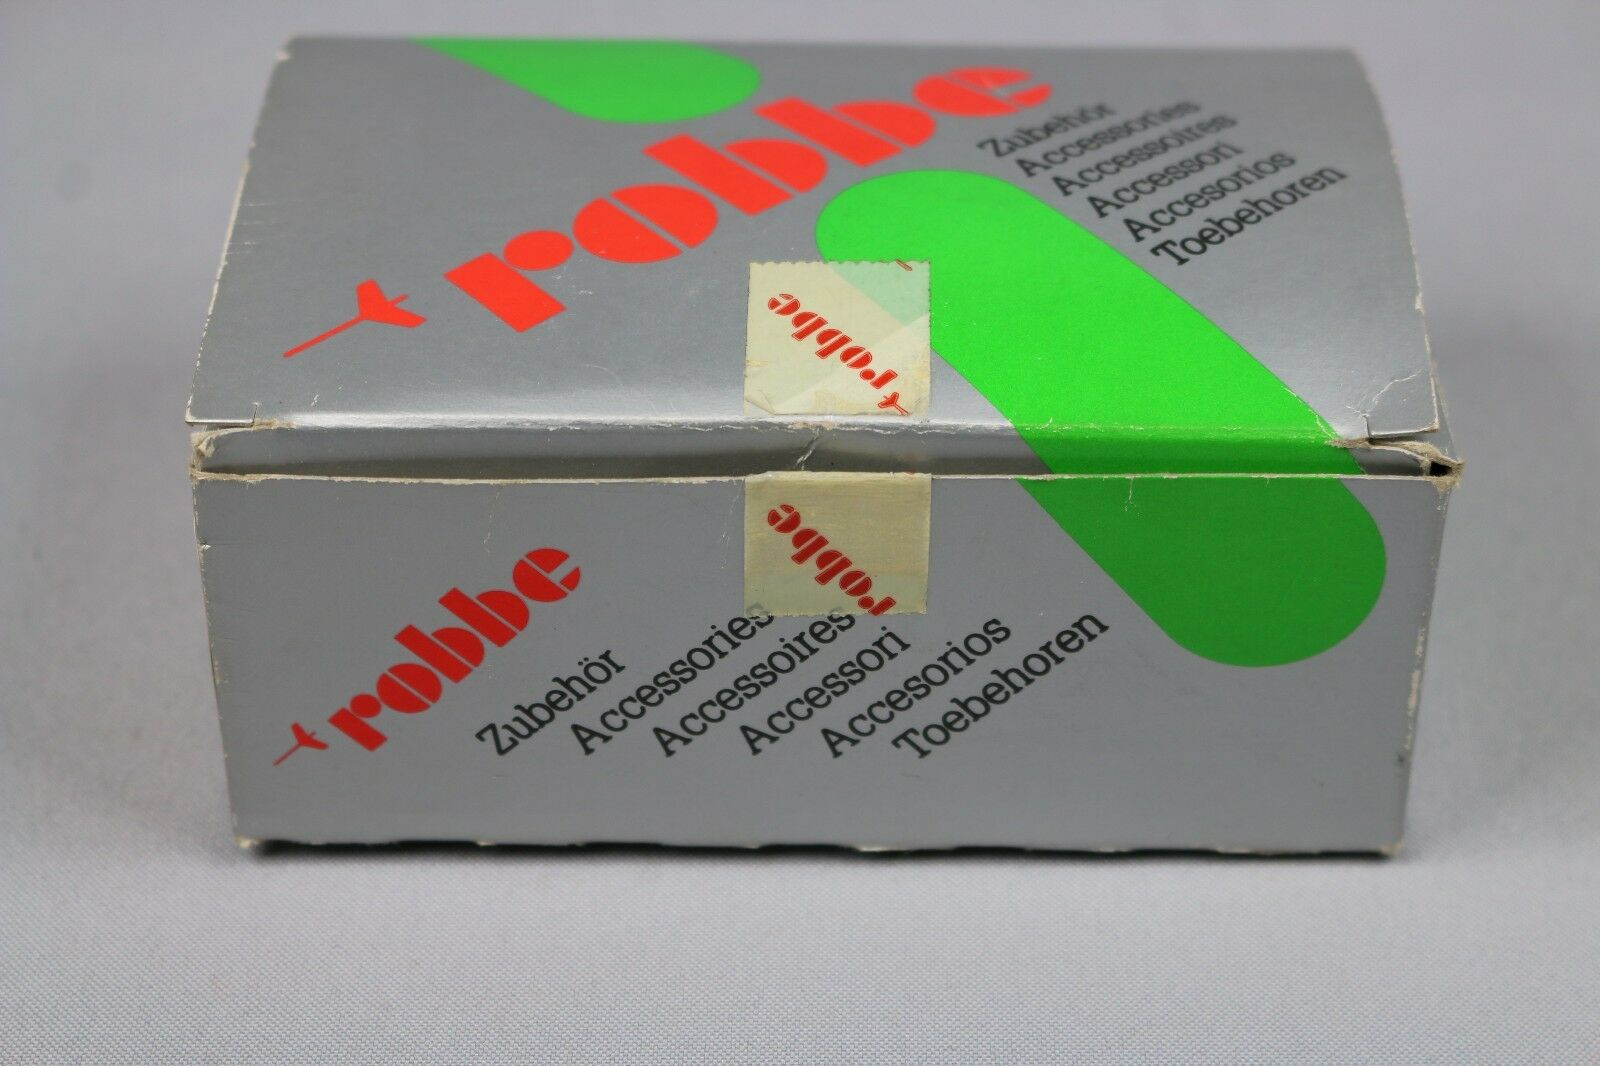 ZC2790 Robbe 6103 transformateur Glowmax Glowmax Glowmax 12 12V - 1.5 à 2V bougies fb910a